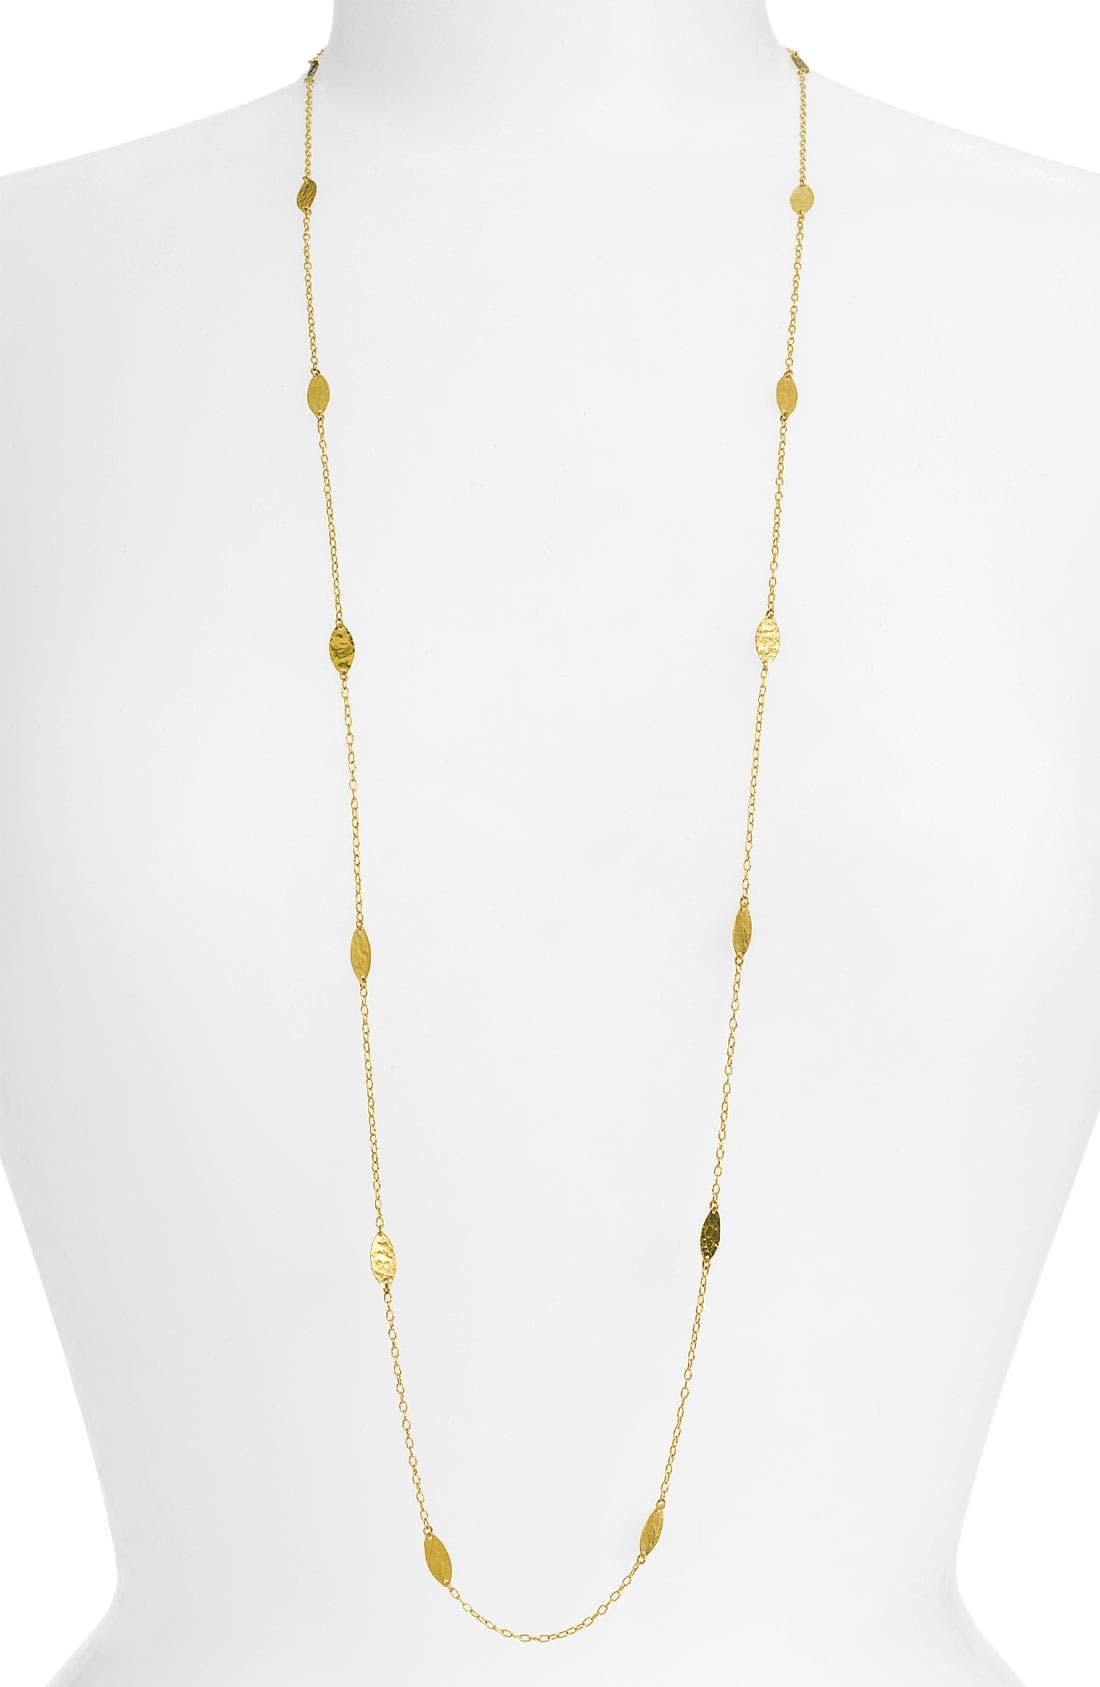 Main Image - Gurhan 'Willow' Long Leaf Necklace